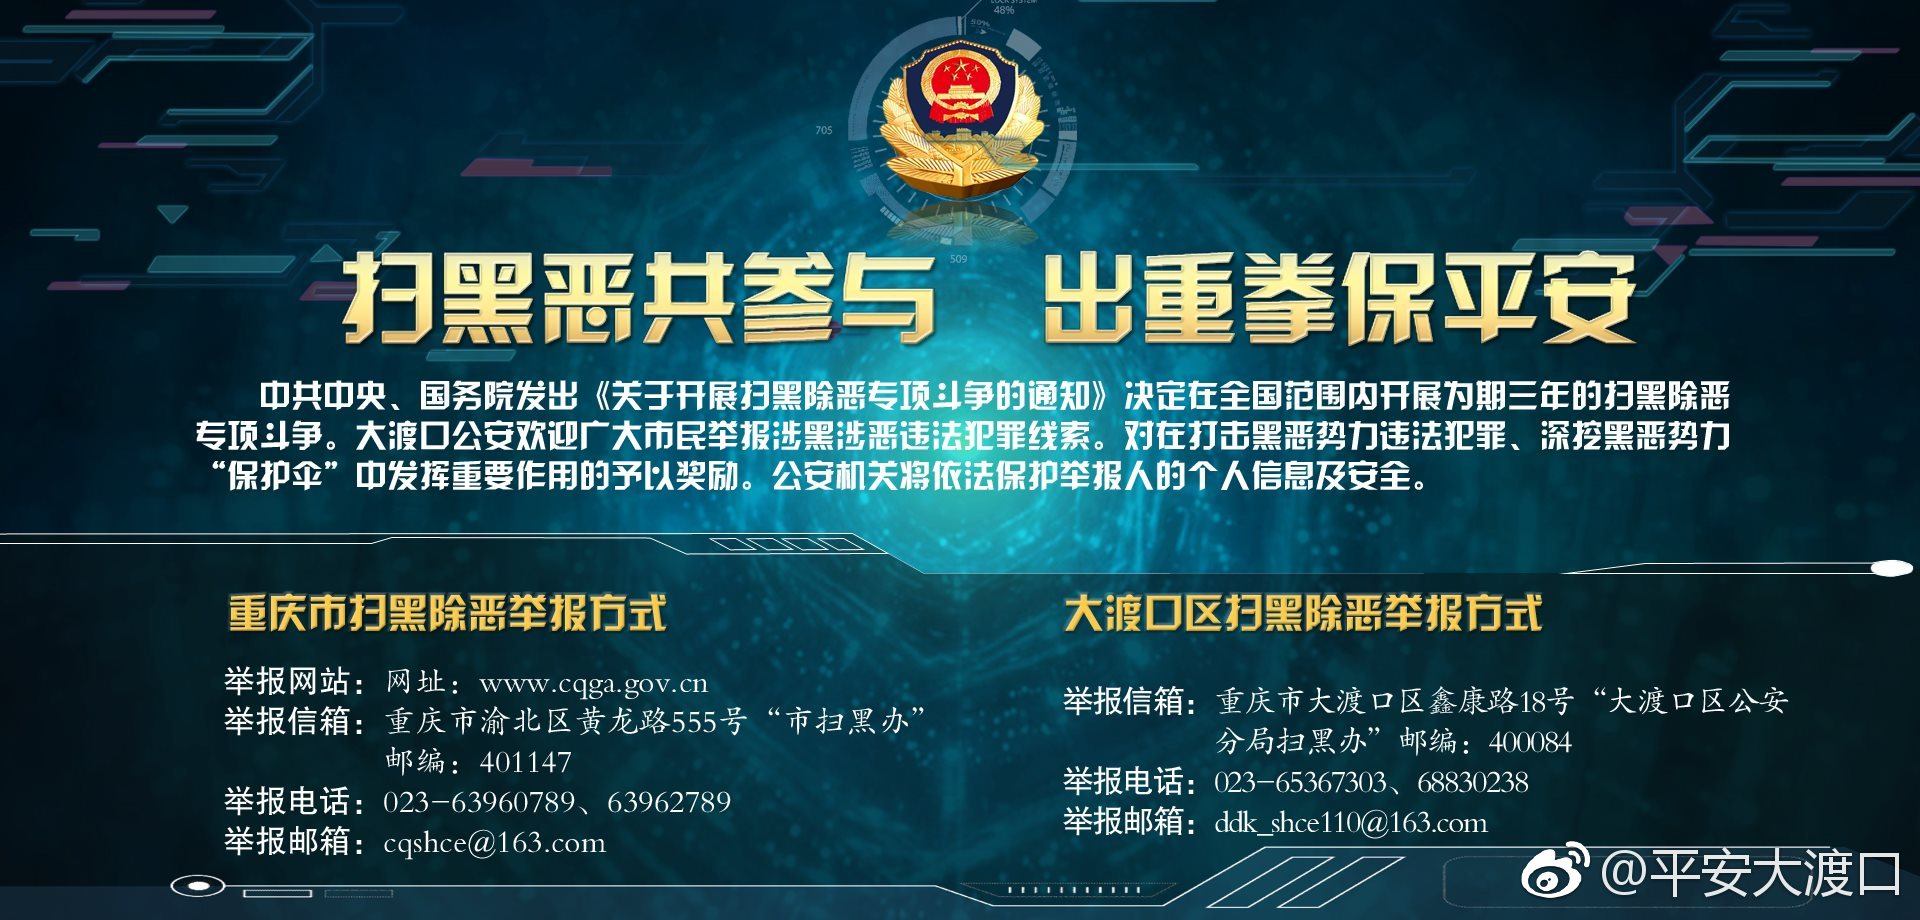 cn 举报信箱:重庆市渝北区黄龙路555号